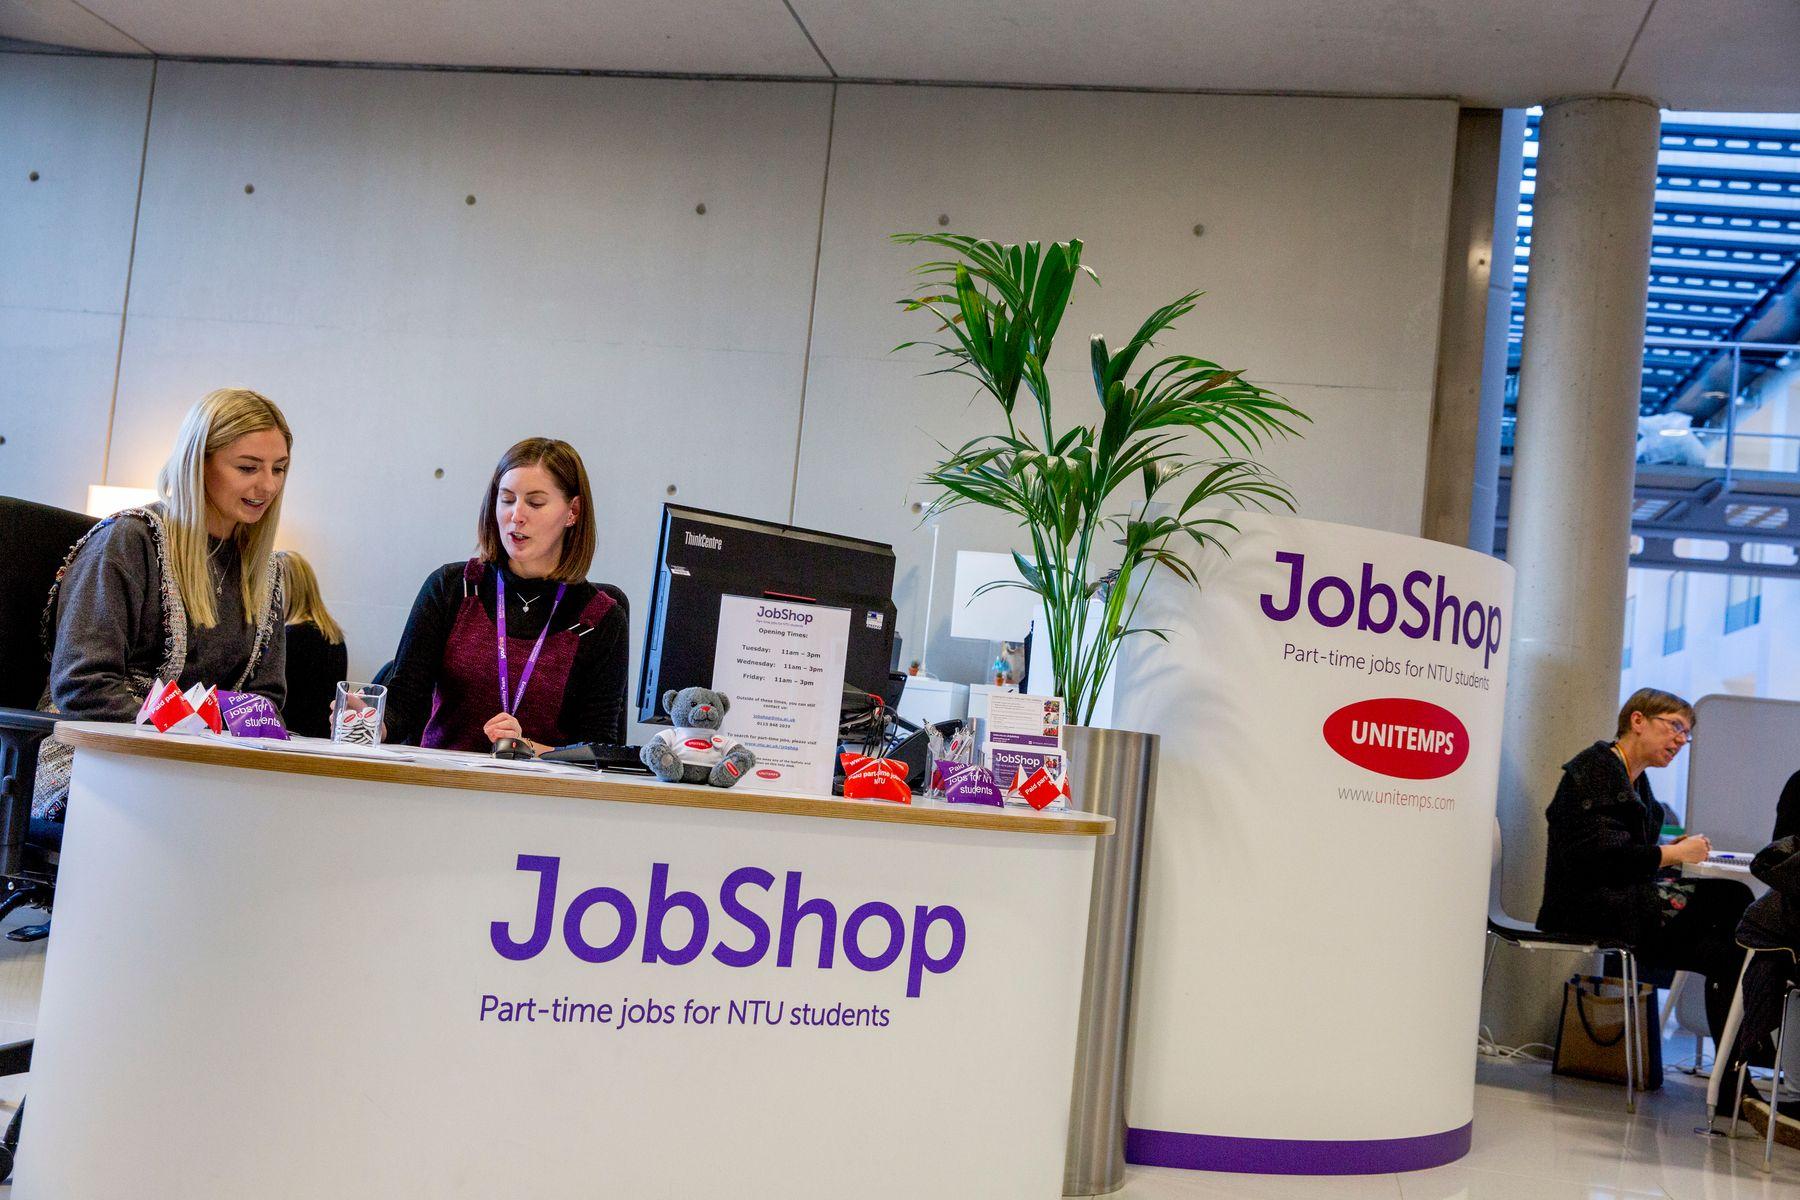 The Job Shop reception area